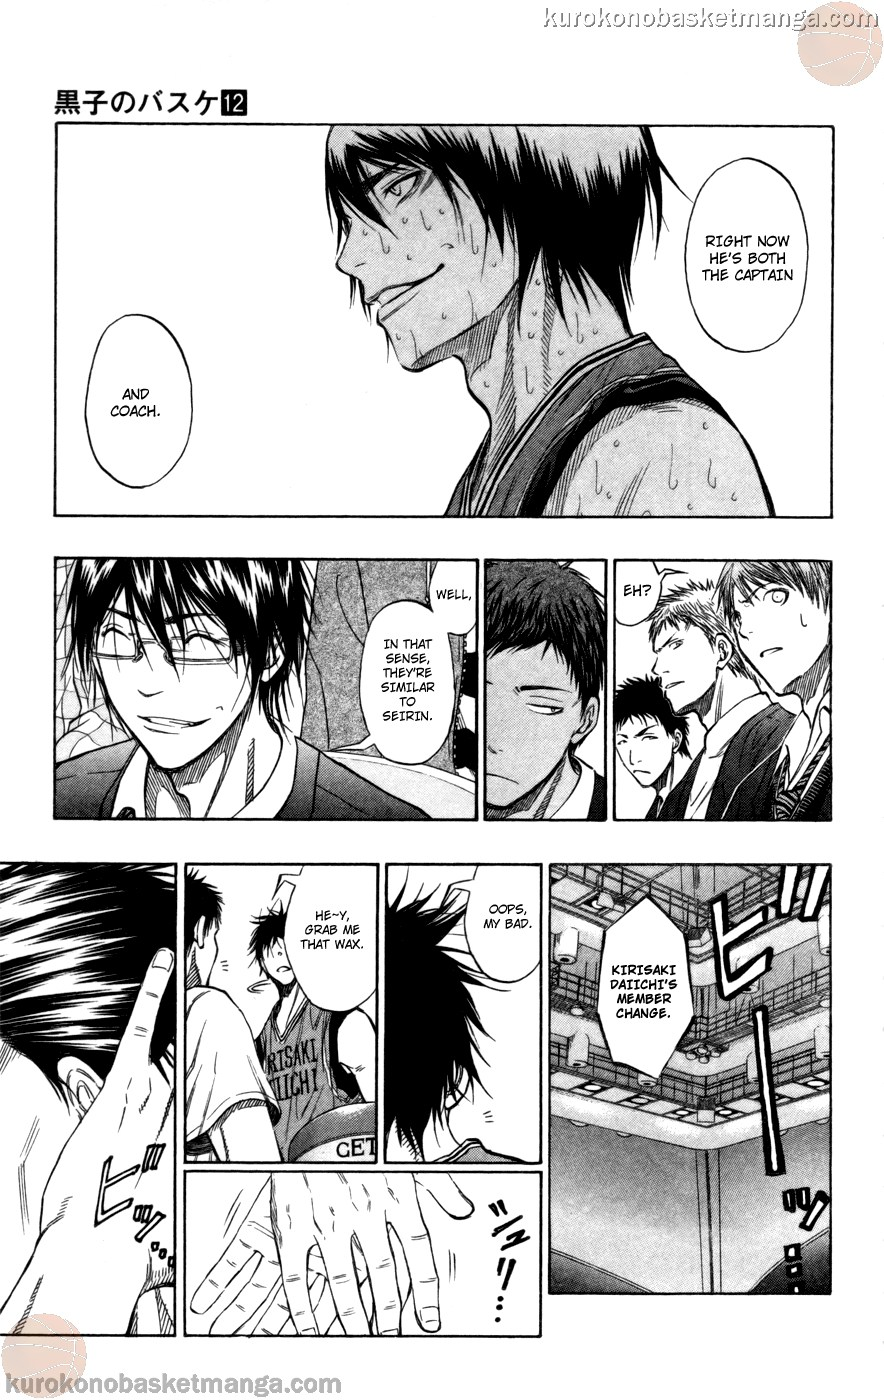 Kuroko no Basket Manga Chapter 104 - Image 05